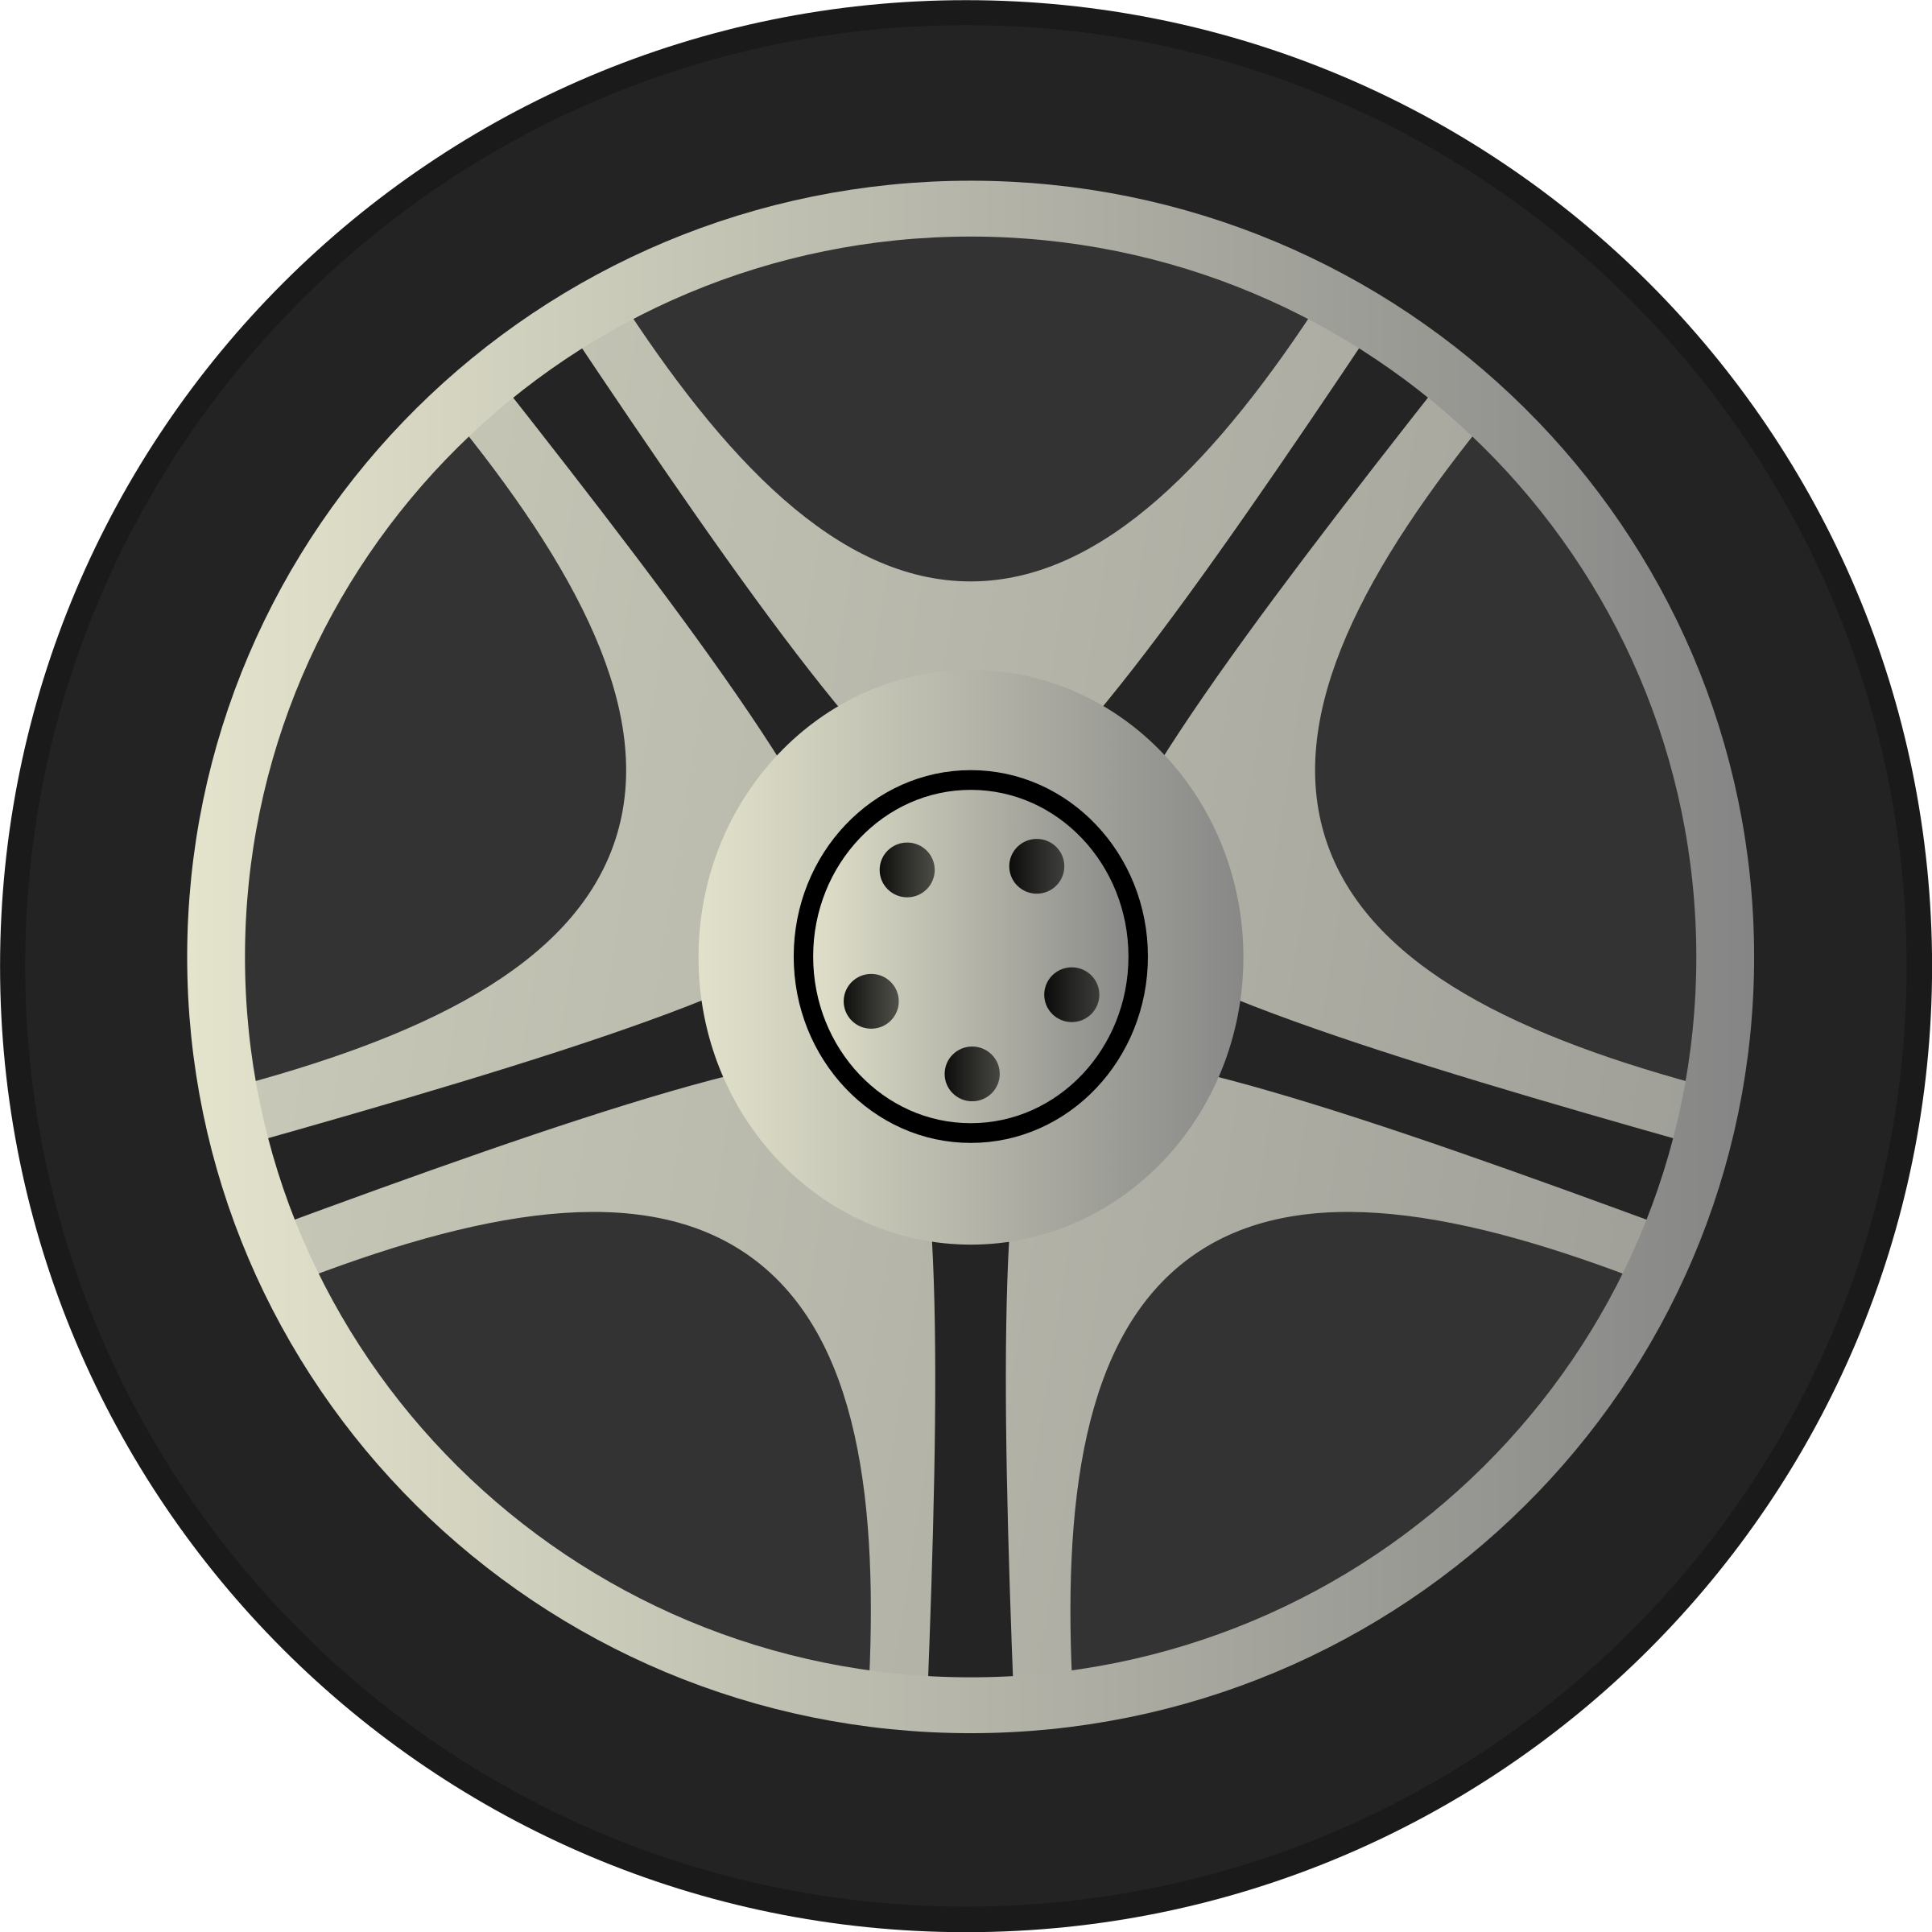 Clip Art Tire Clip Art tire clip art clipart best tumundografico